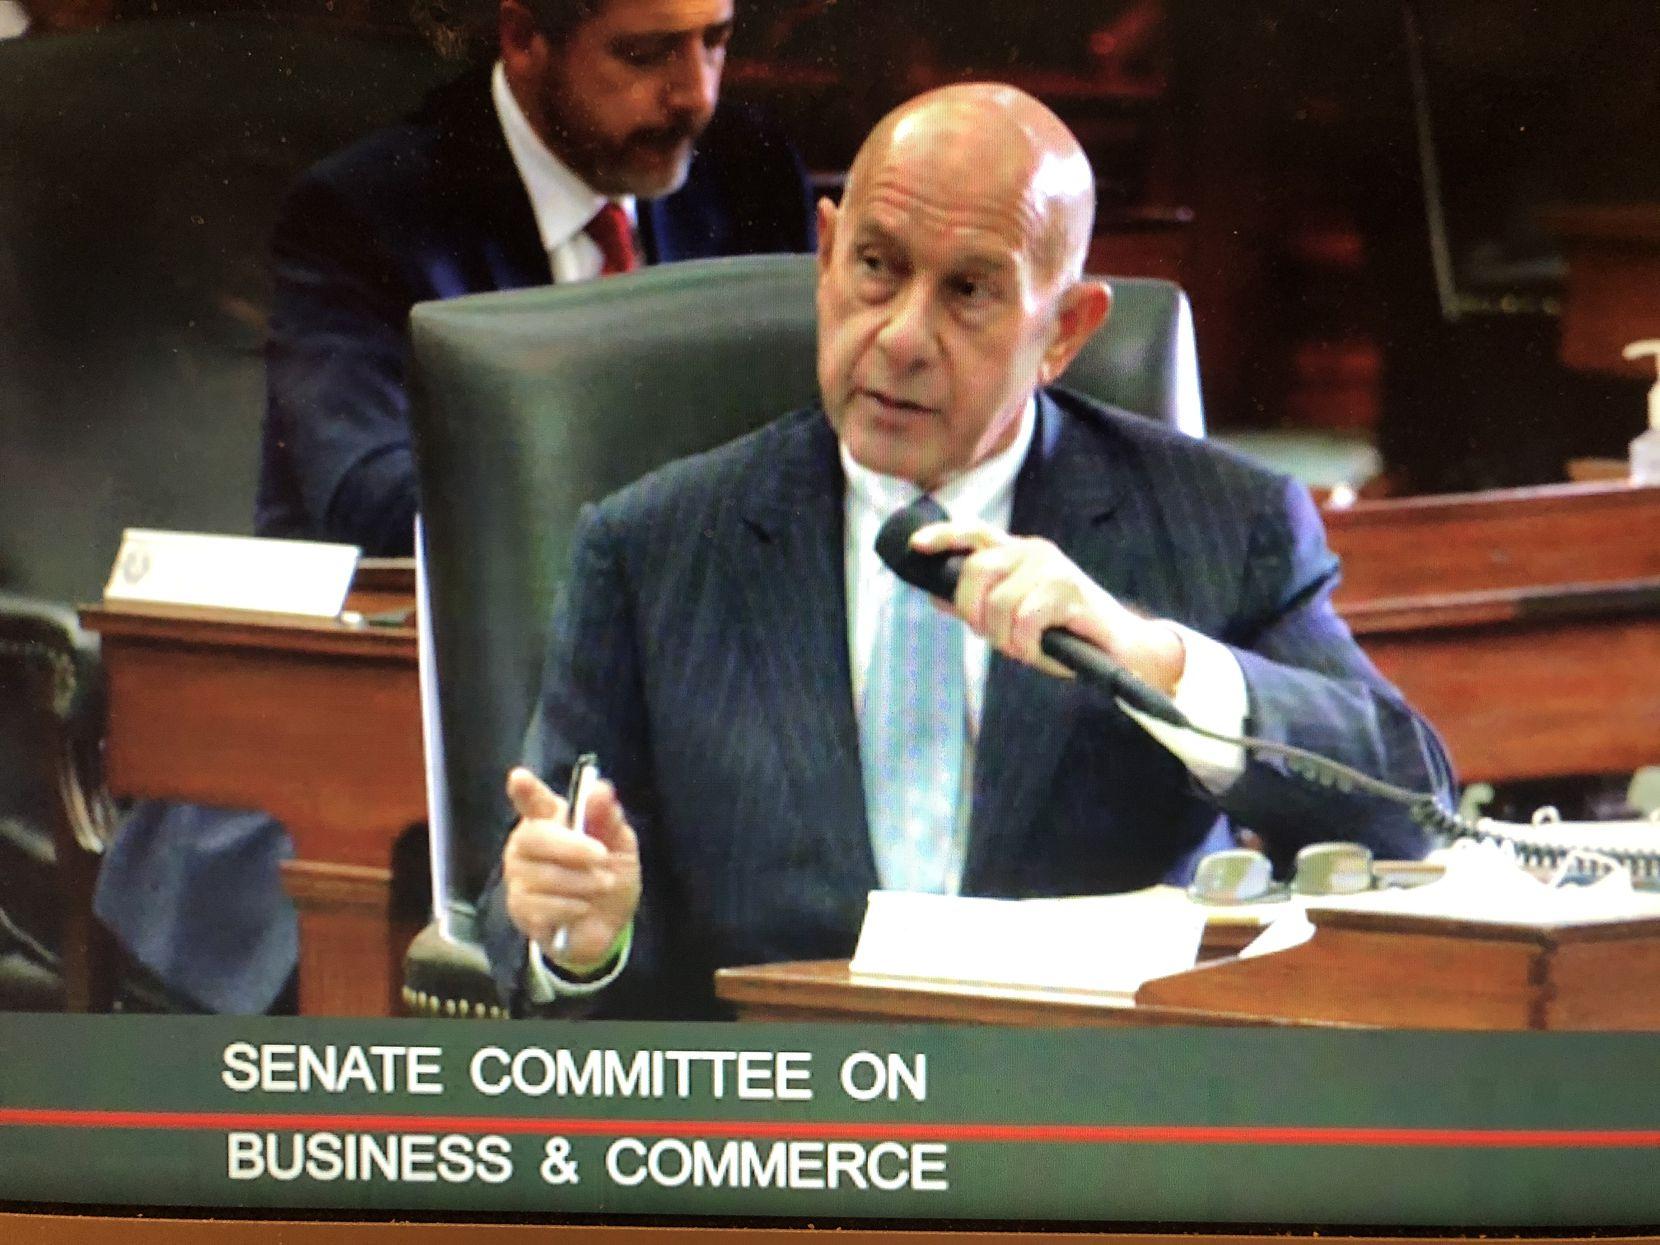 Sen. John Whitmire, D-Houston, was a senator who berated PUC Chairman DeAnn Walker on Feb. 25, 2021.